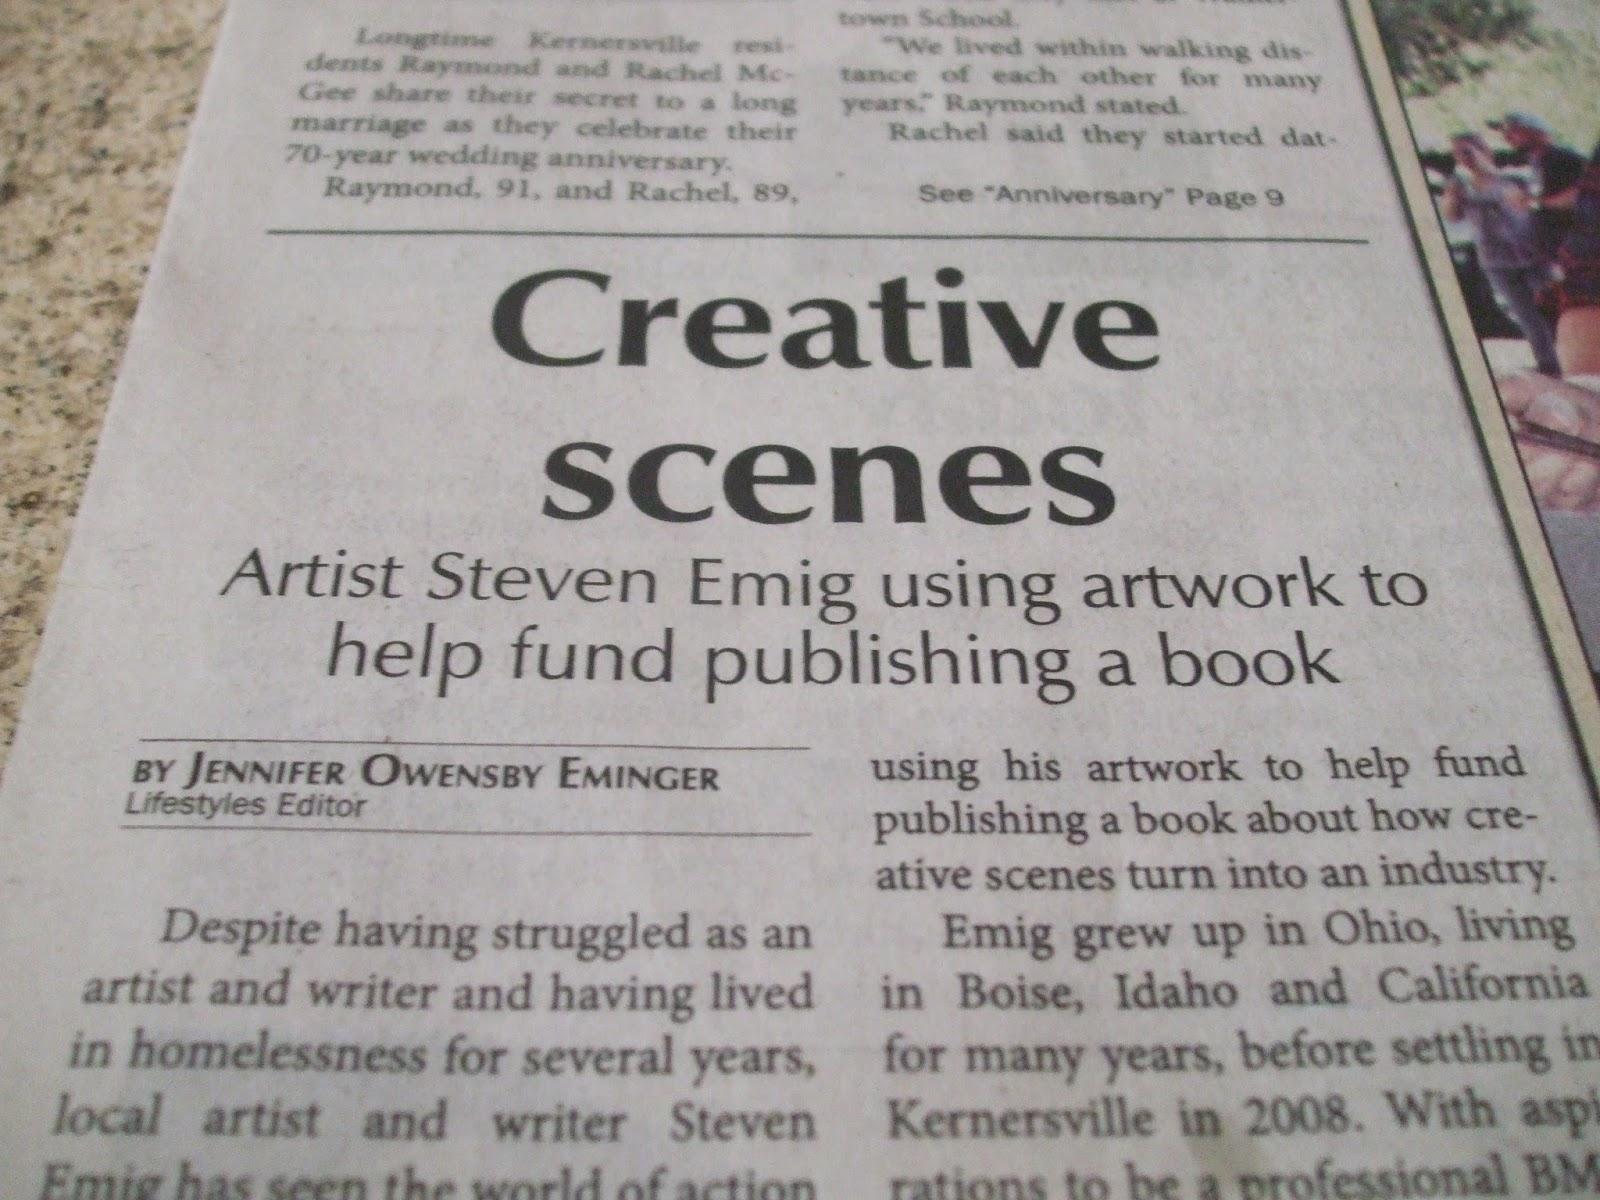 Steve Emig Art: Kernersville News interview with me